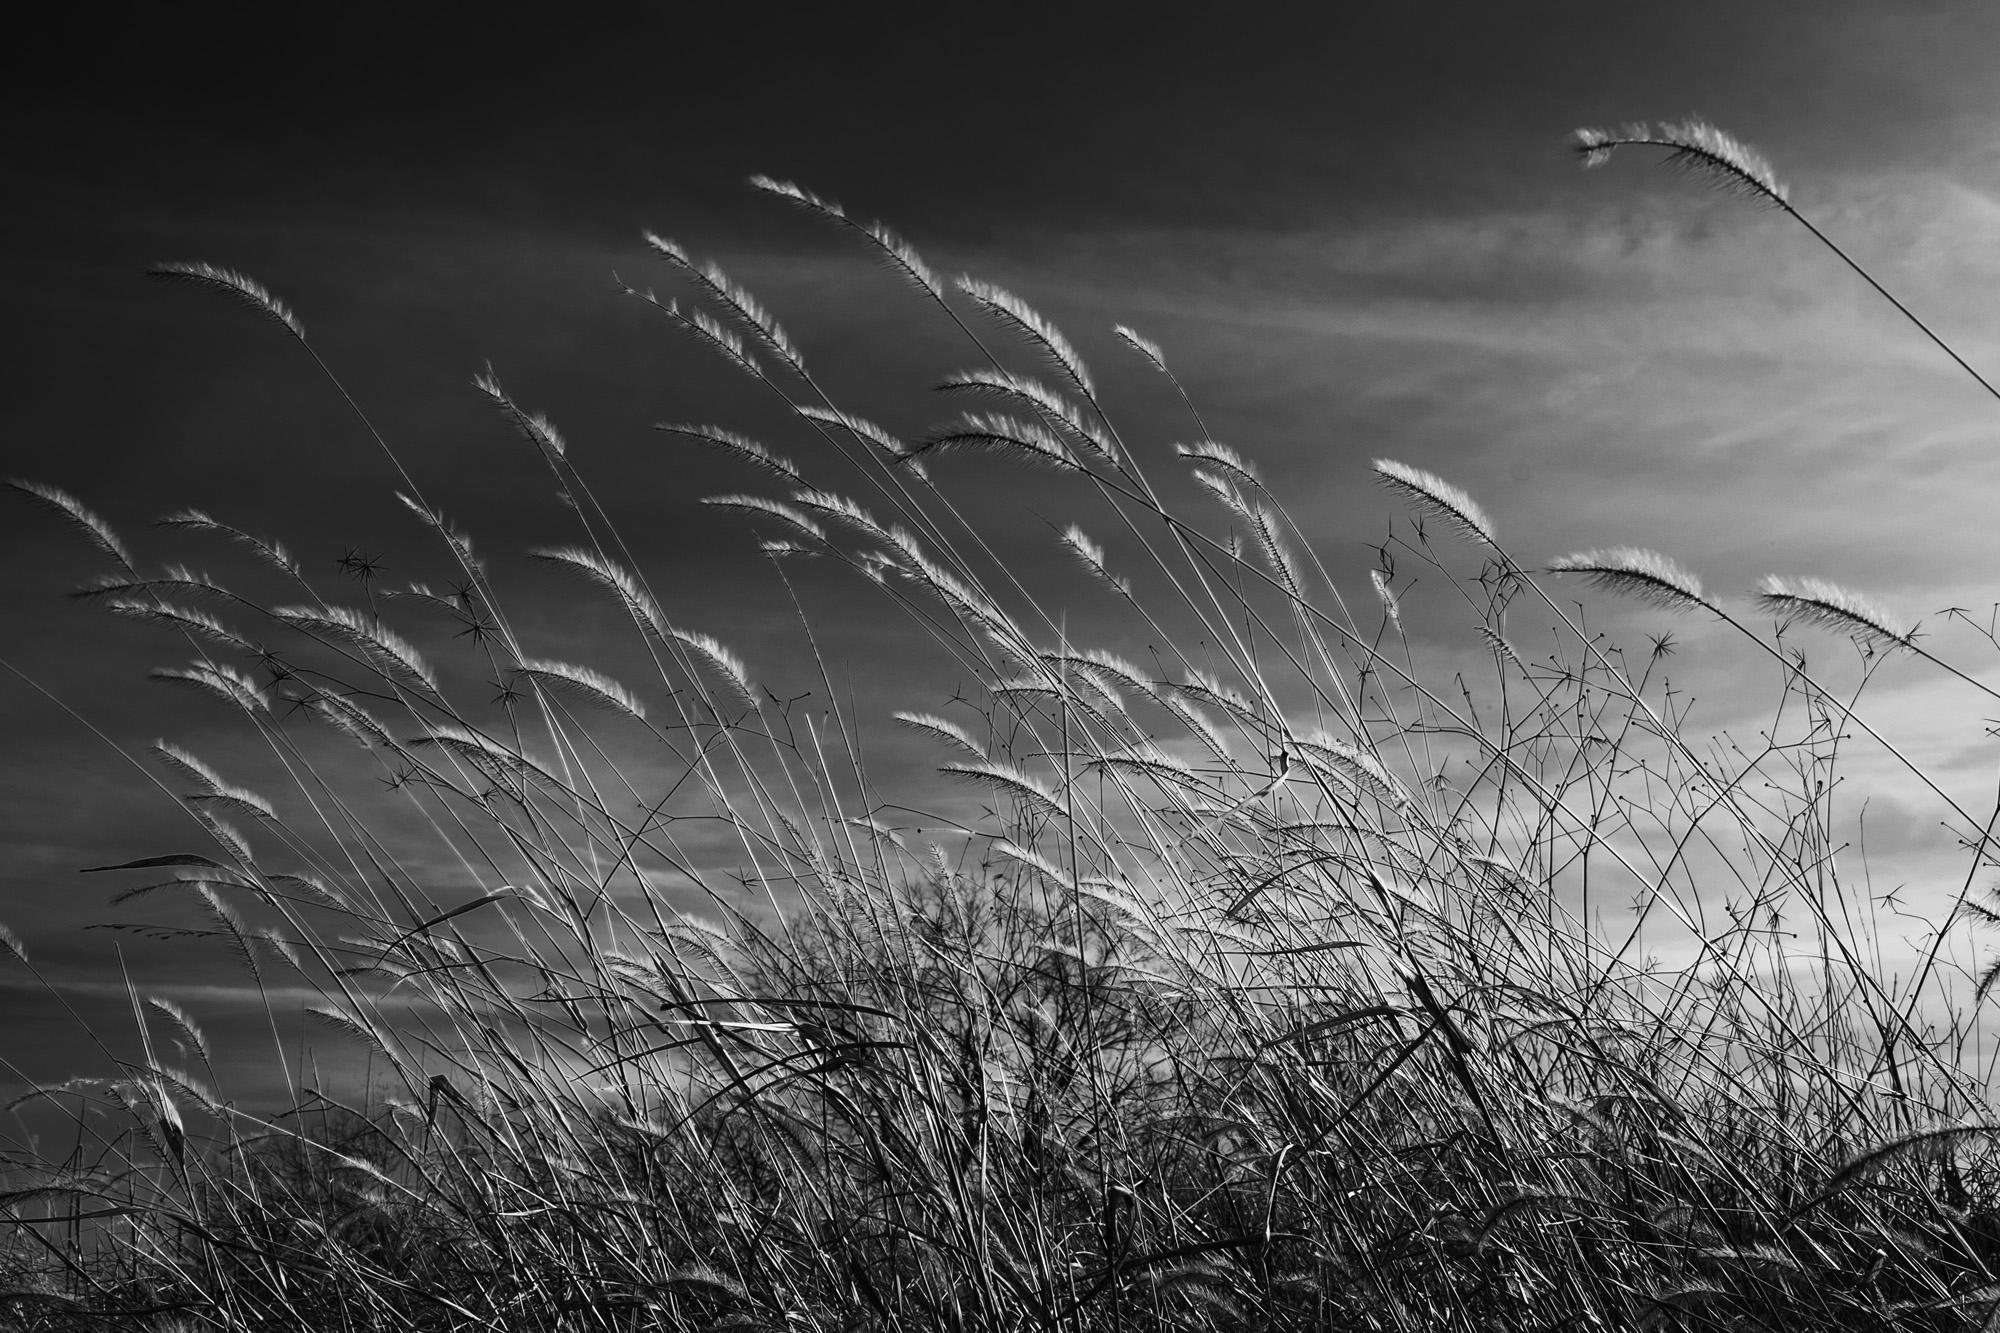 Winter Grasses Against a Dark Sky